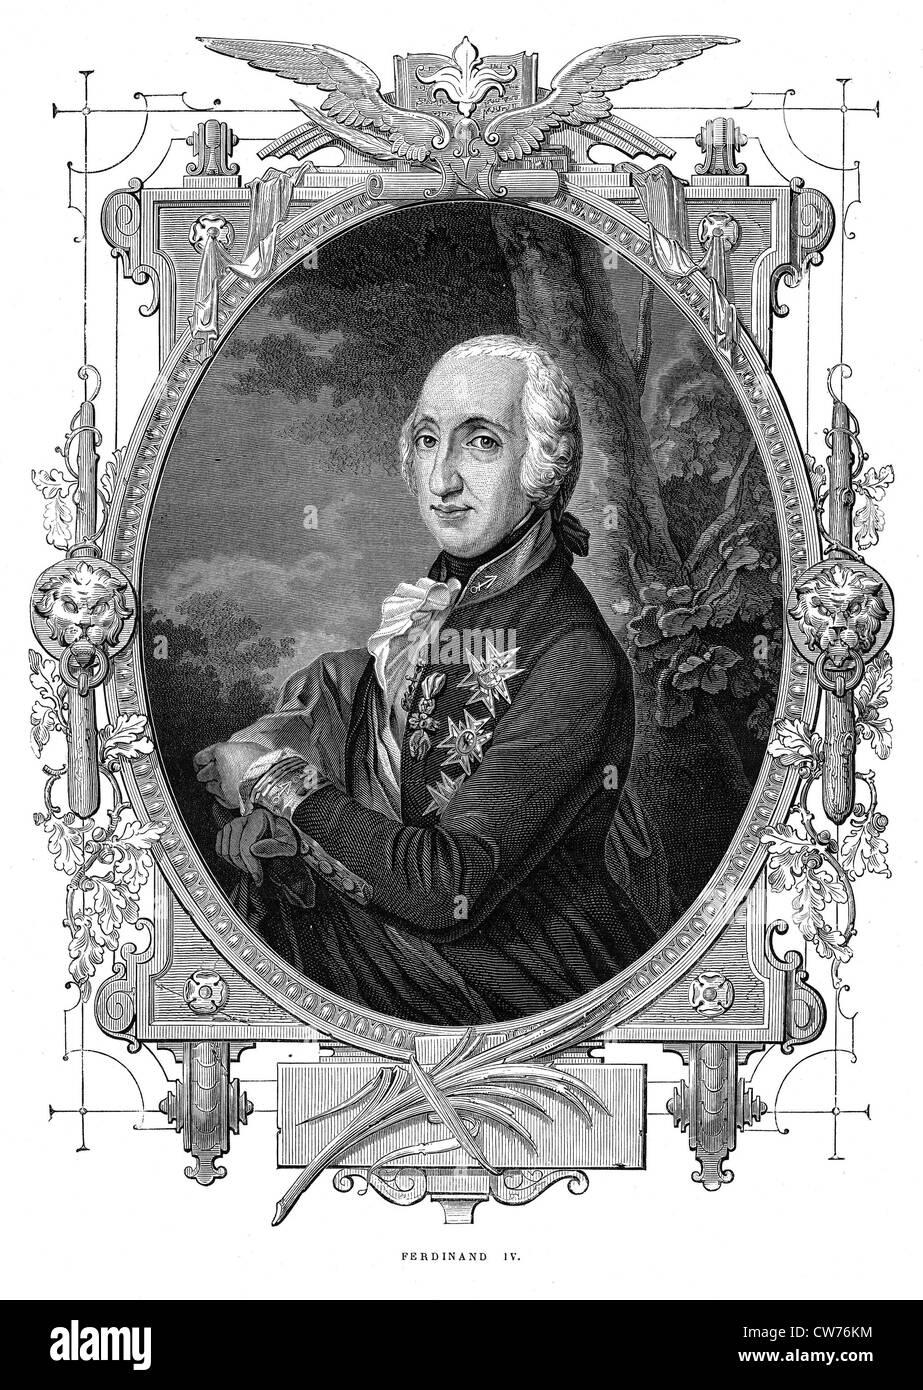 Ferdinand IV - Stock Image